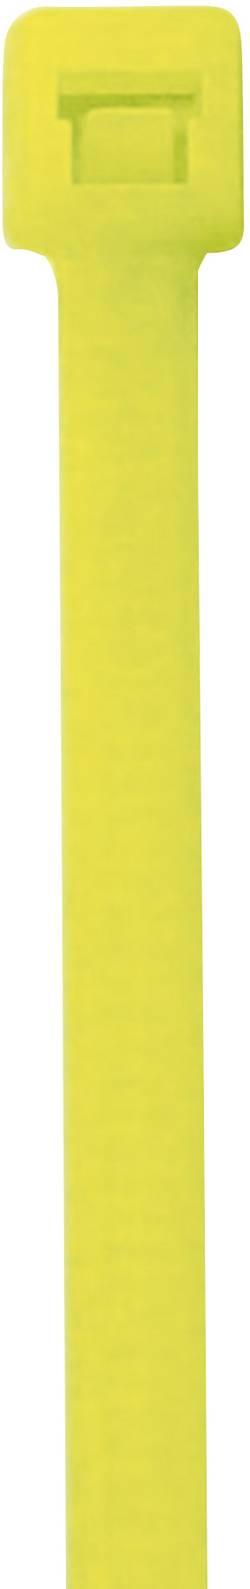 Serre-câbles 4.60 mm x 192 mm jaune PB Fastener CTF-07-050-13 crantage intérieur 50 pc(s)